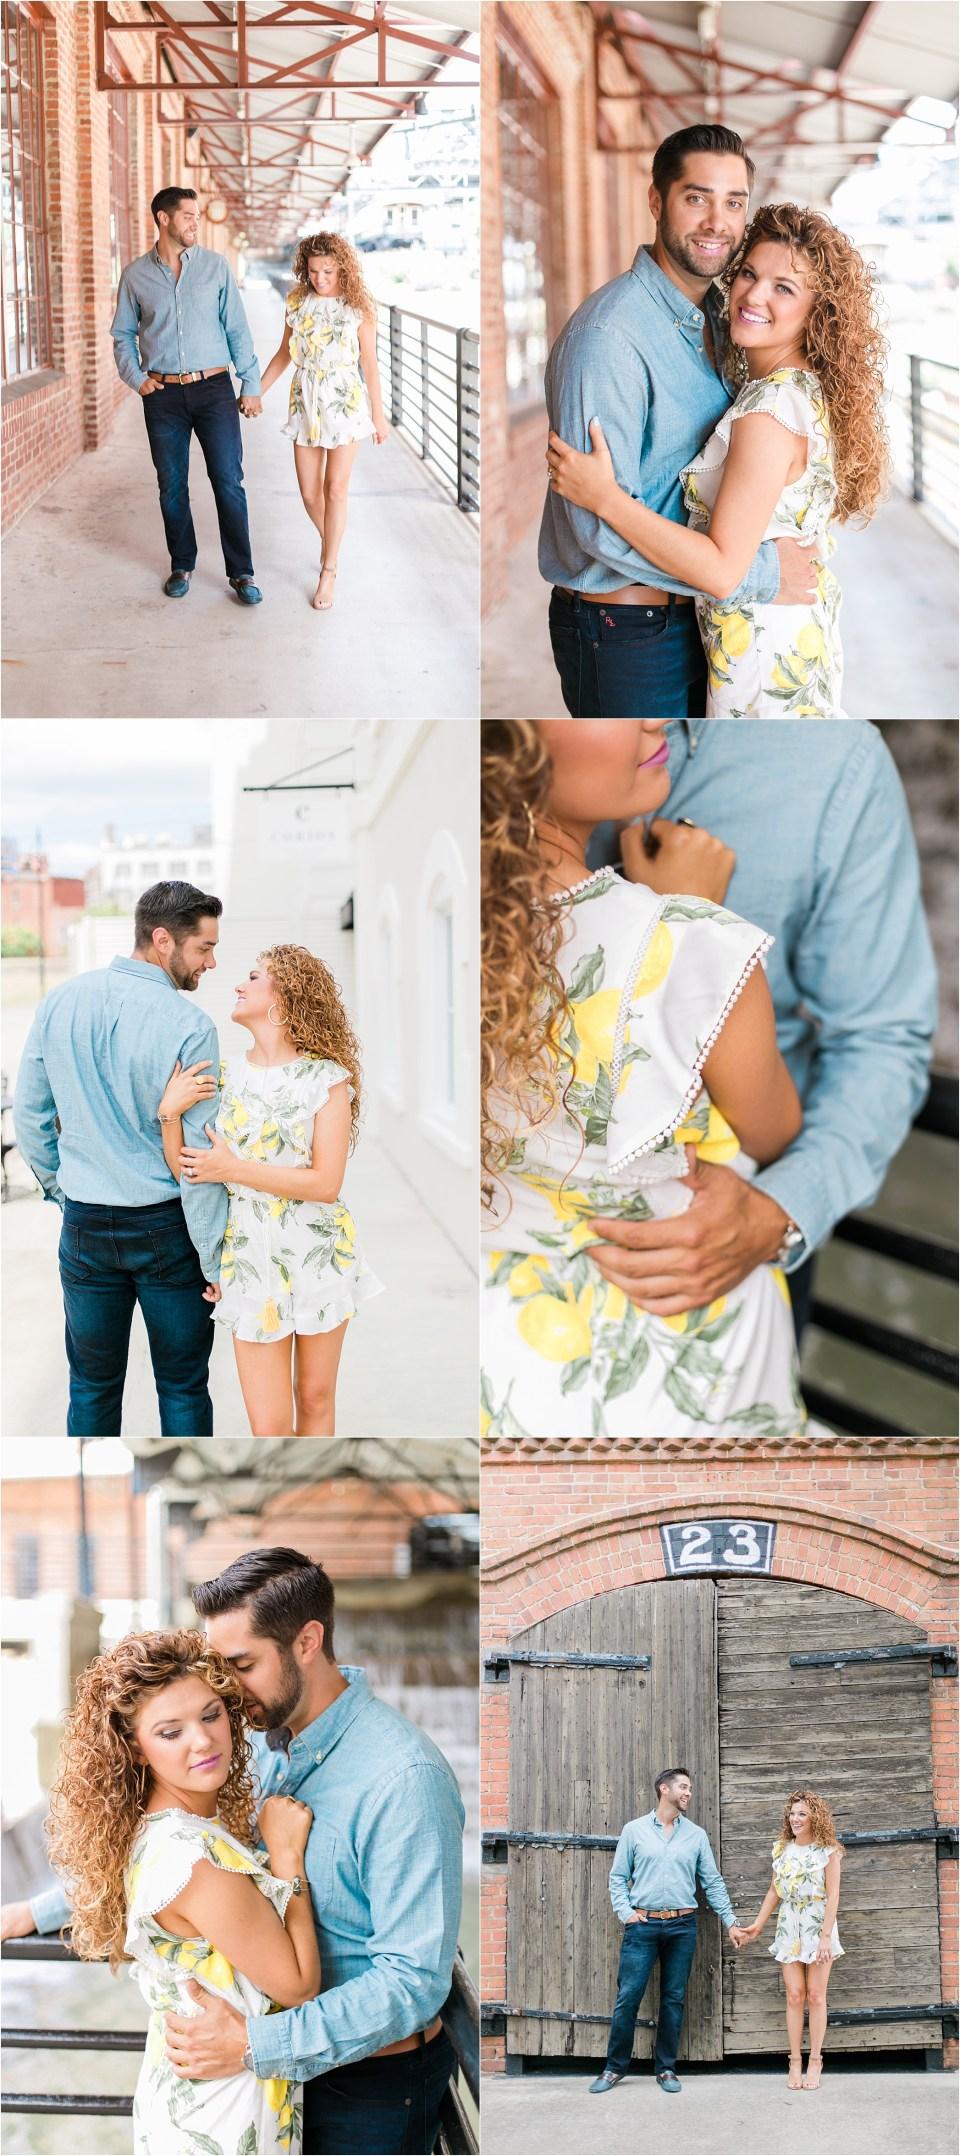 costola photography,destination wedding,engagement,engagement photography,maryland photographer,maryland wedding,wedding,wedding photography,